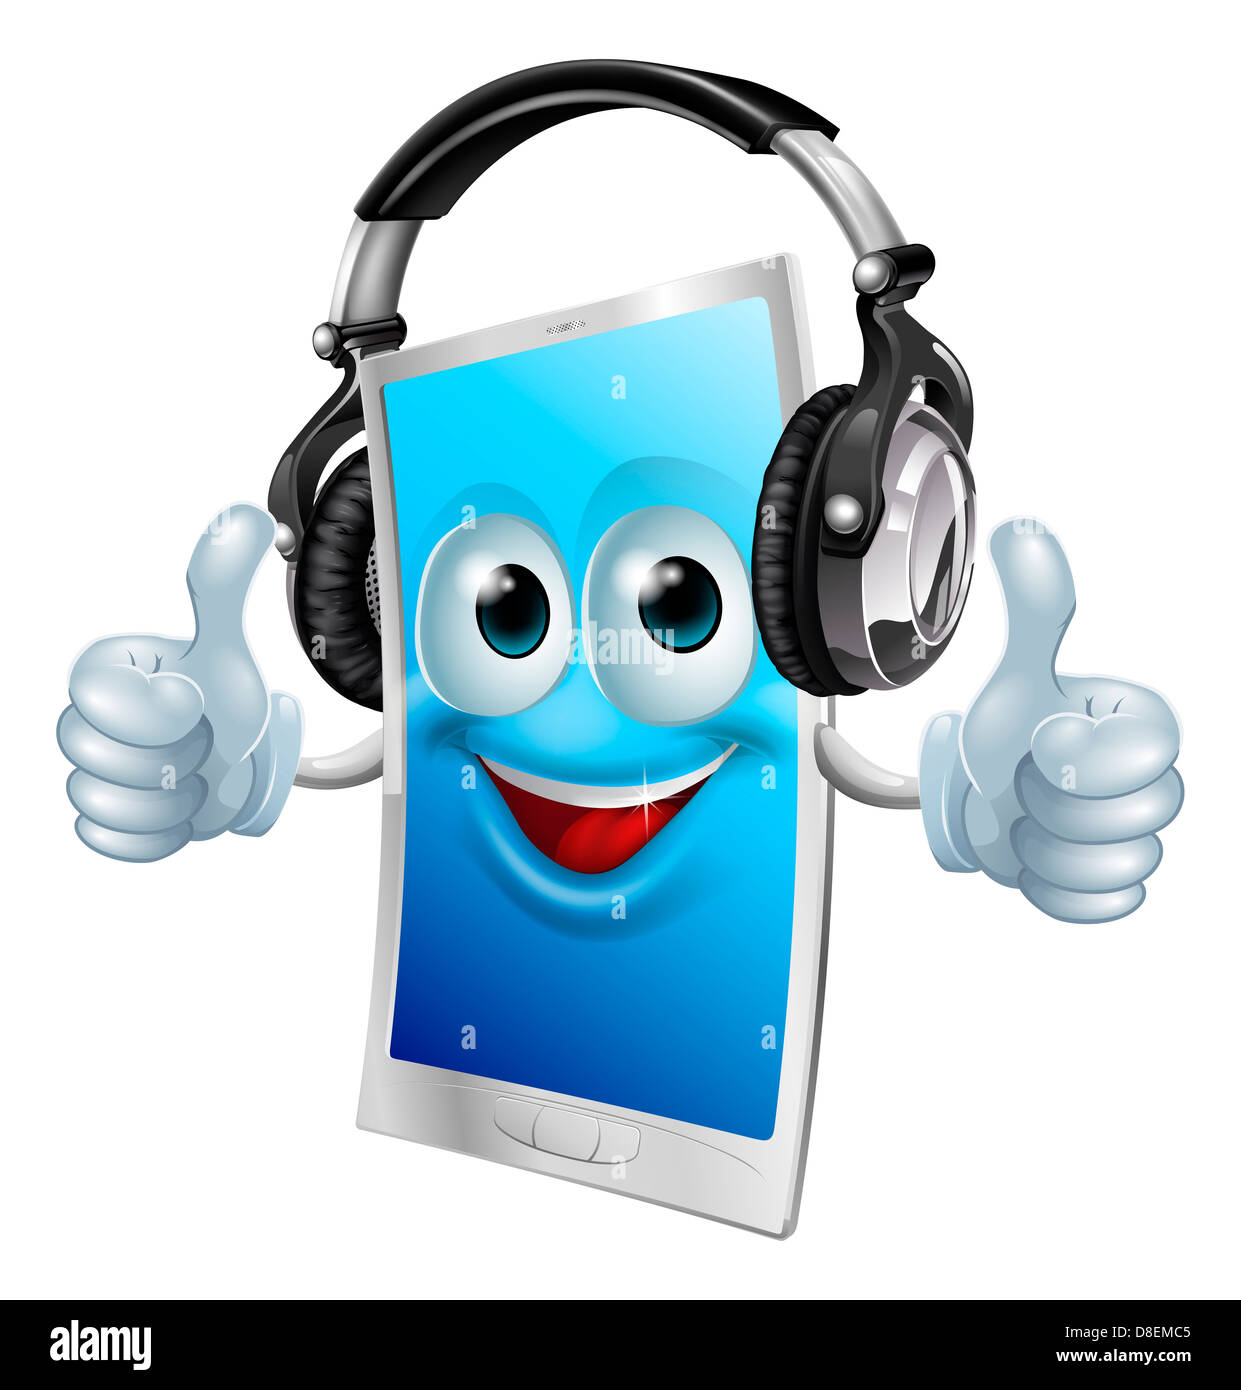 A Drawing Of A Cartoon Smiling Headphones Phone Man Stock Photo Alamy